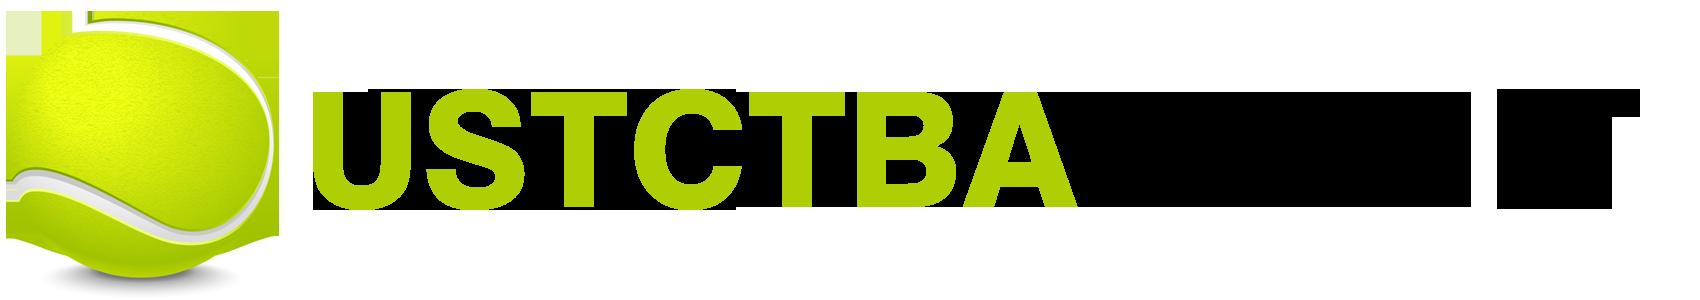 USTCTBA tennis©